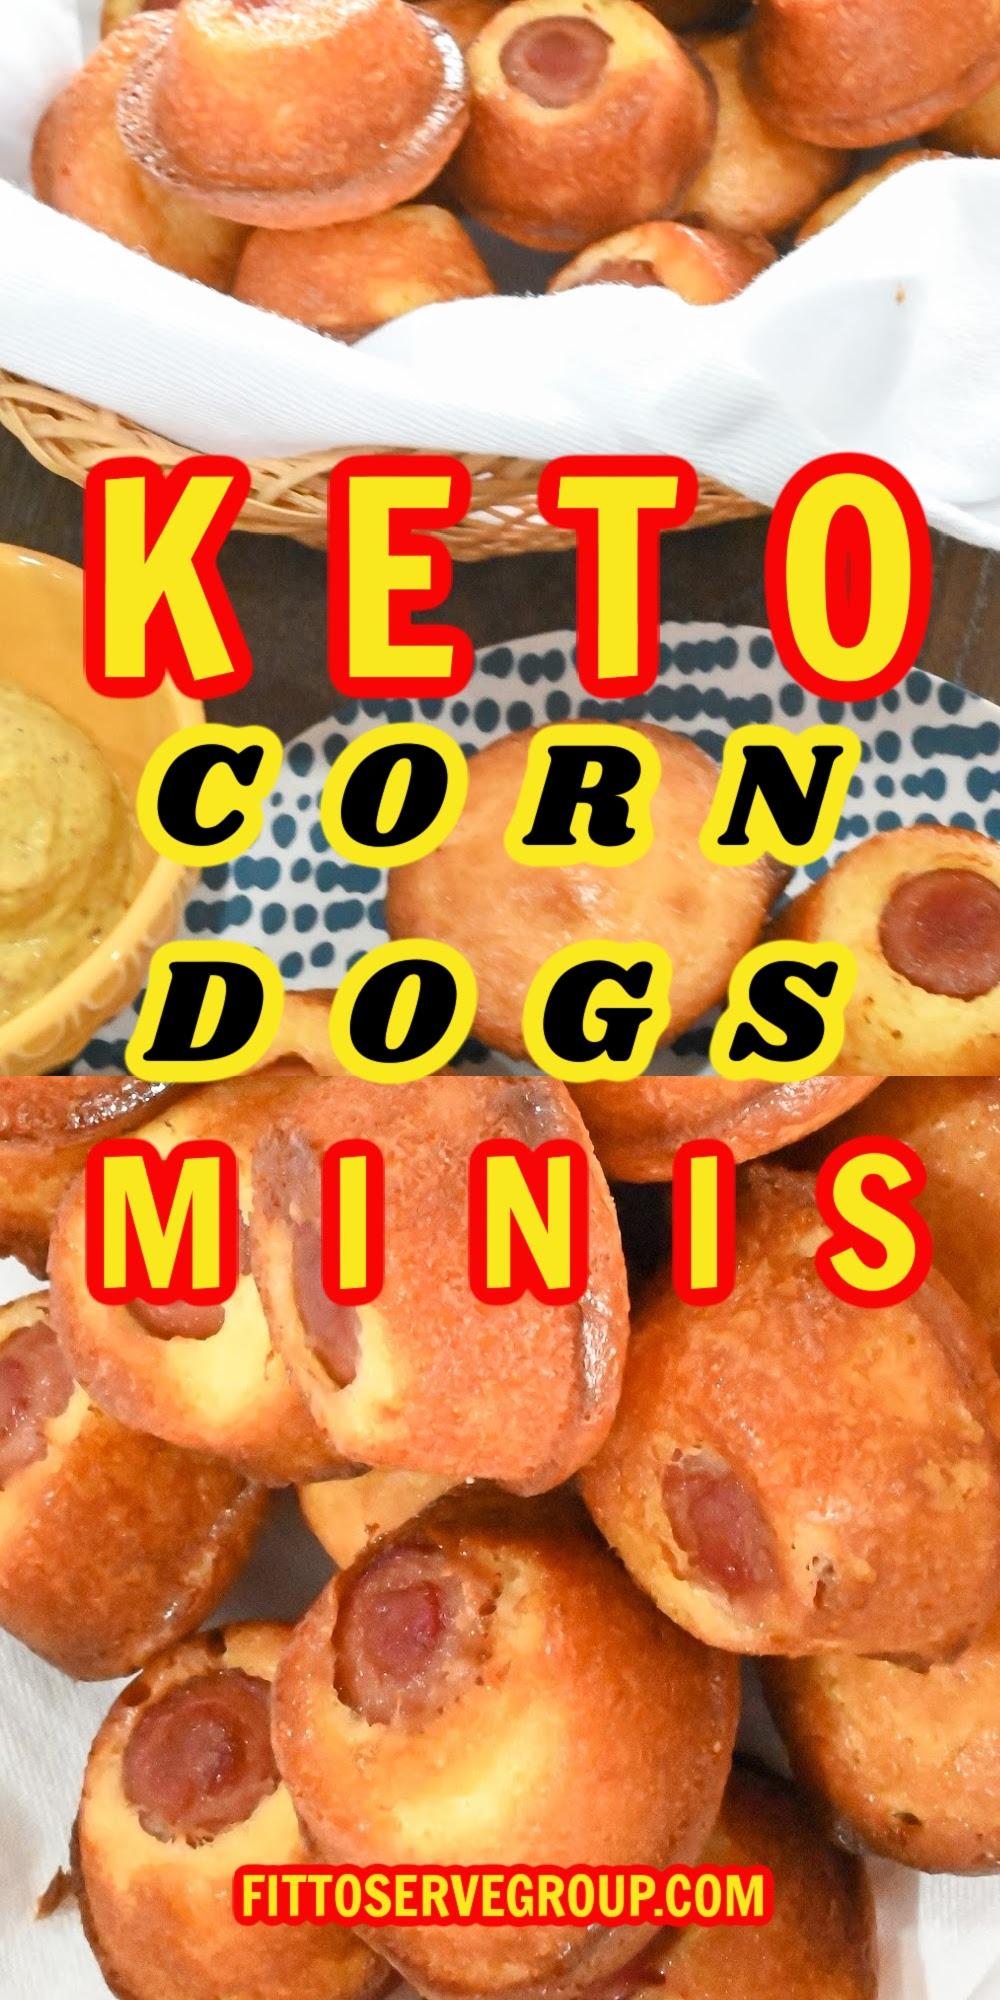 Keto Corn Dogs Minis